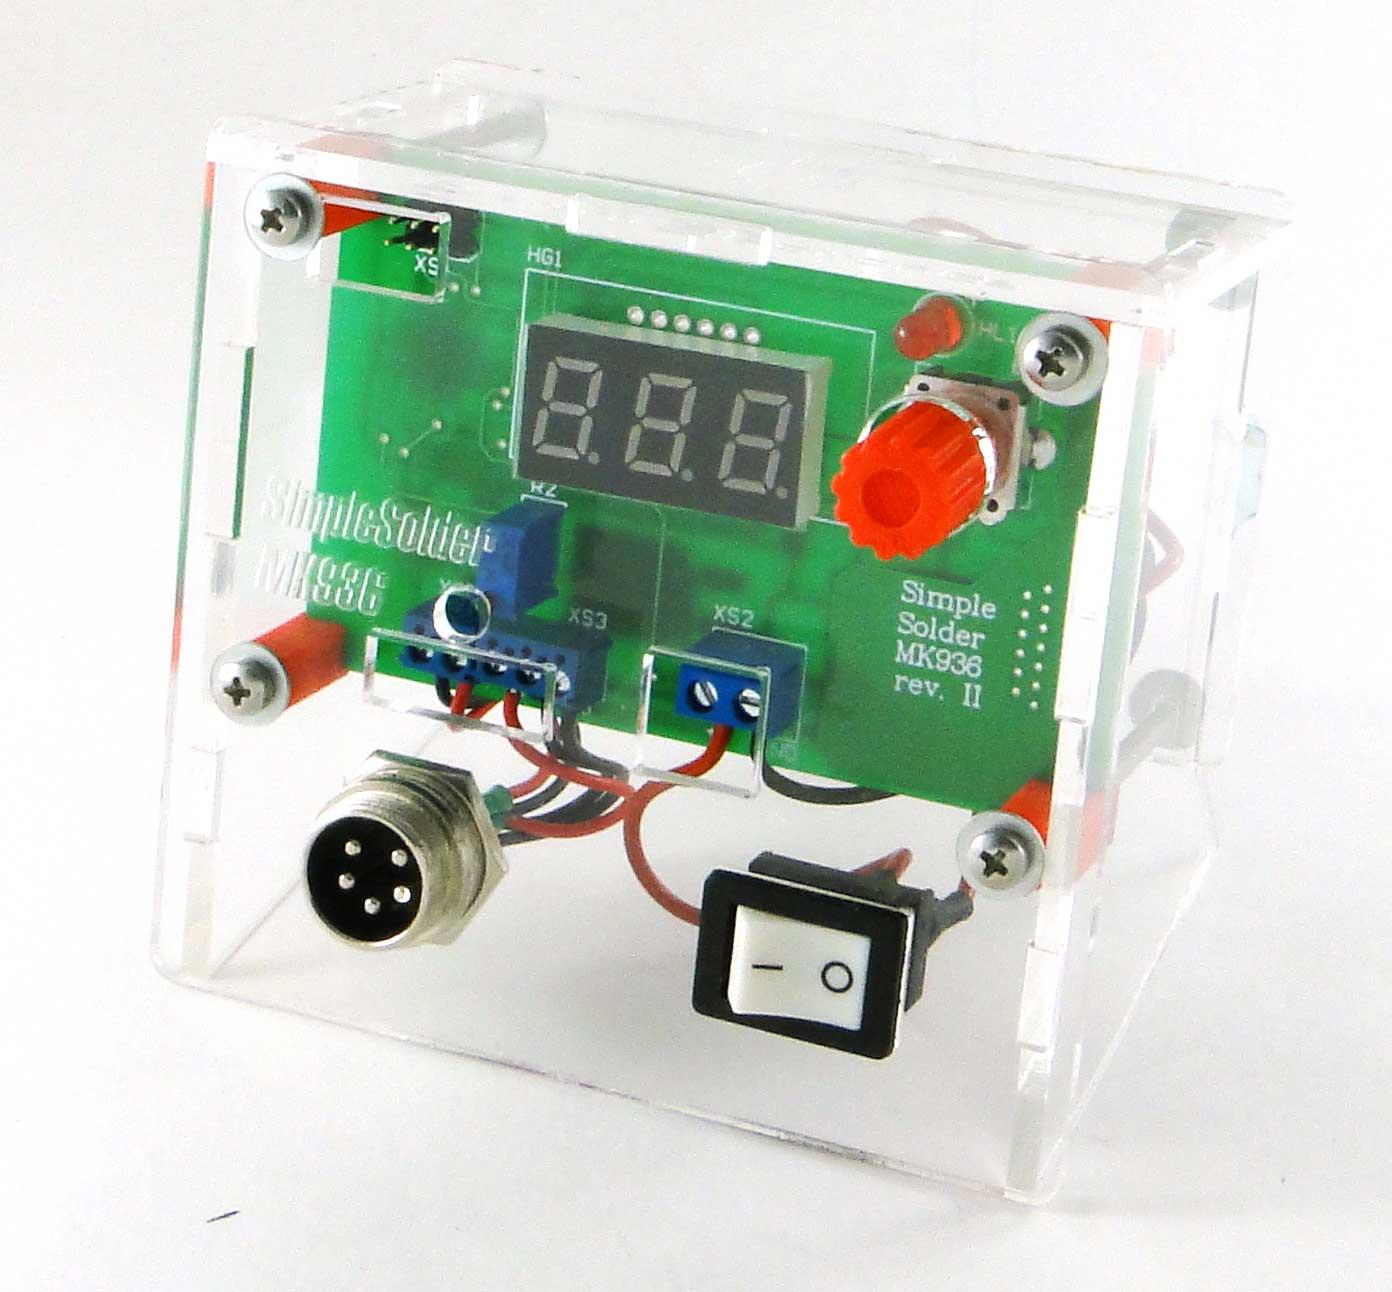 Simple Solder MK936 SMD. Паяльная станция на SMD-компонентах своими руками - 14